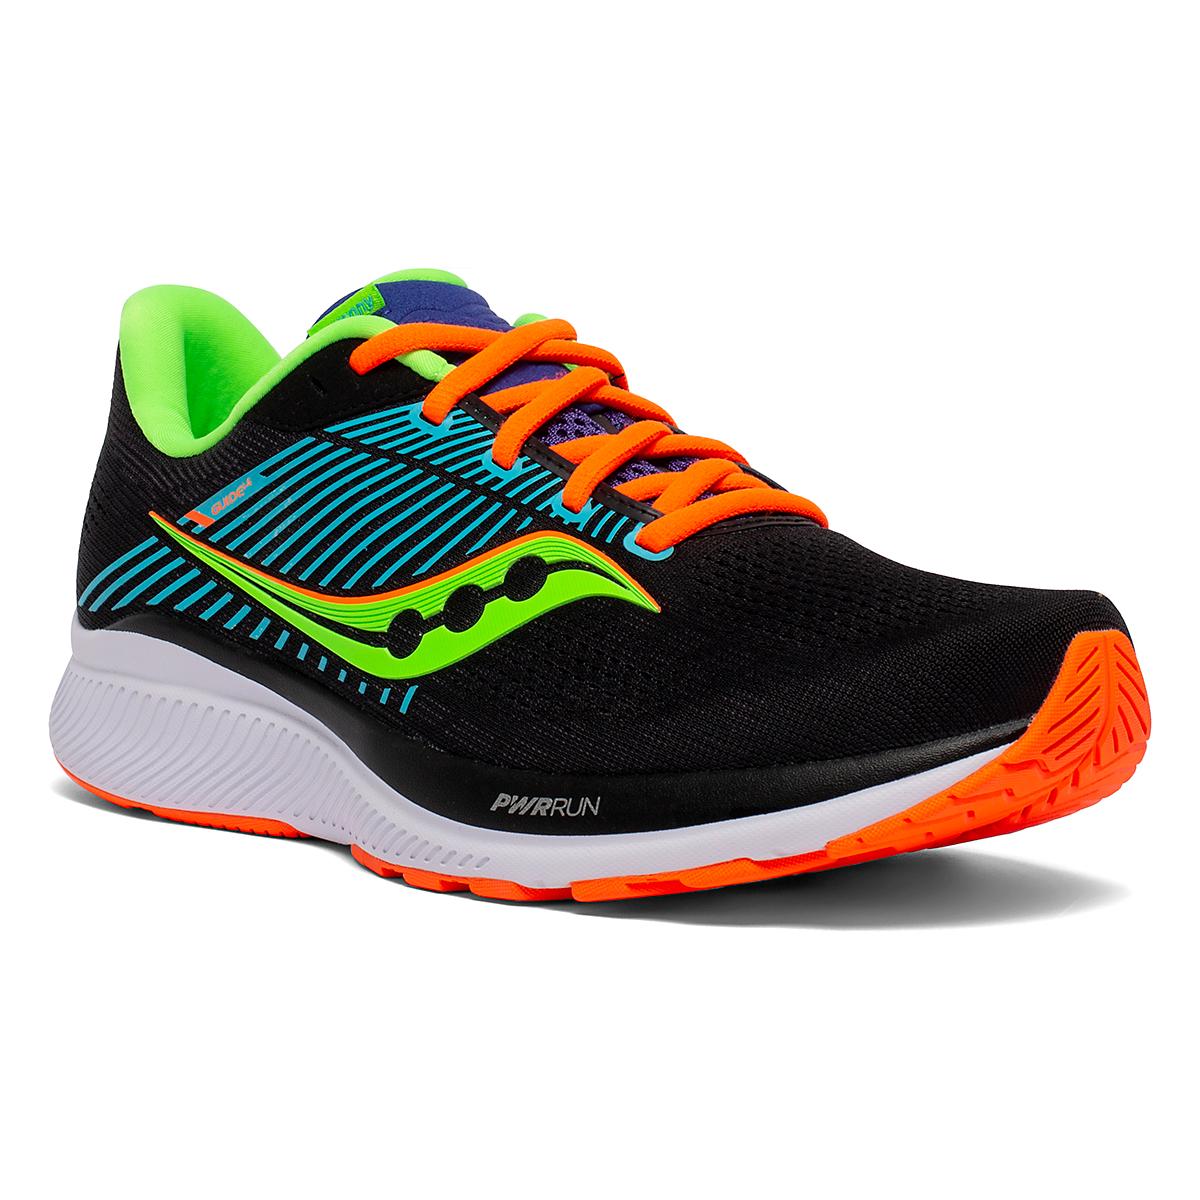 Men's Saucony Guide 14 Running Shoe - Color: Future/Black - Size: 7 - Width: Regular, Future/Black, large, image 3